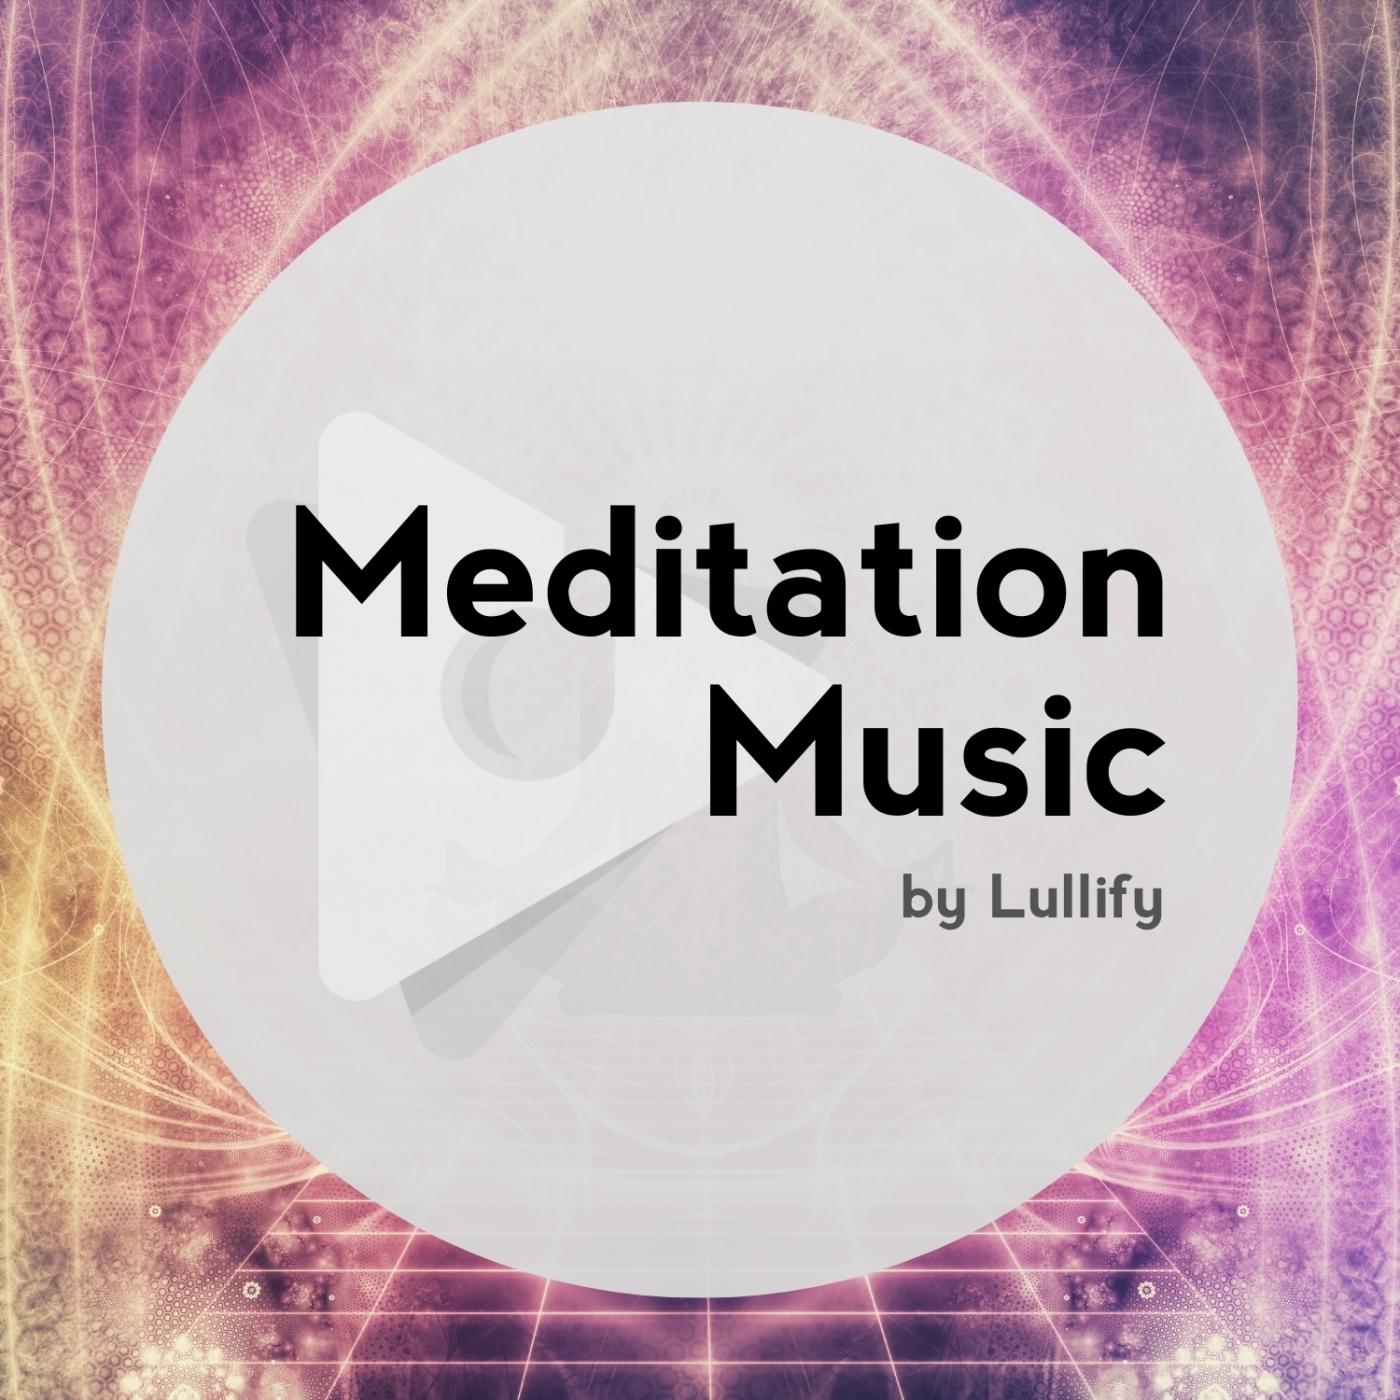 Meditation Music by Lullify